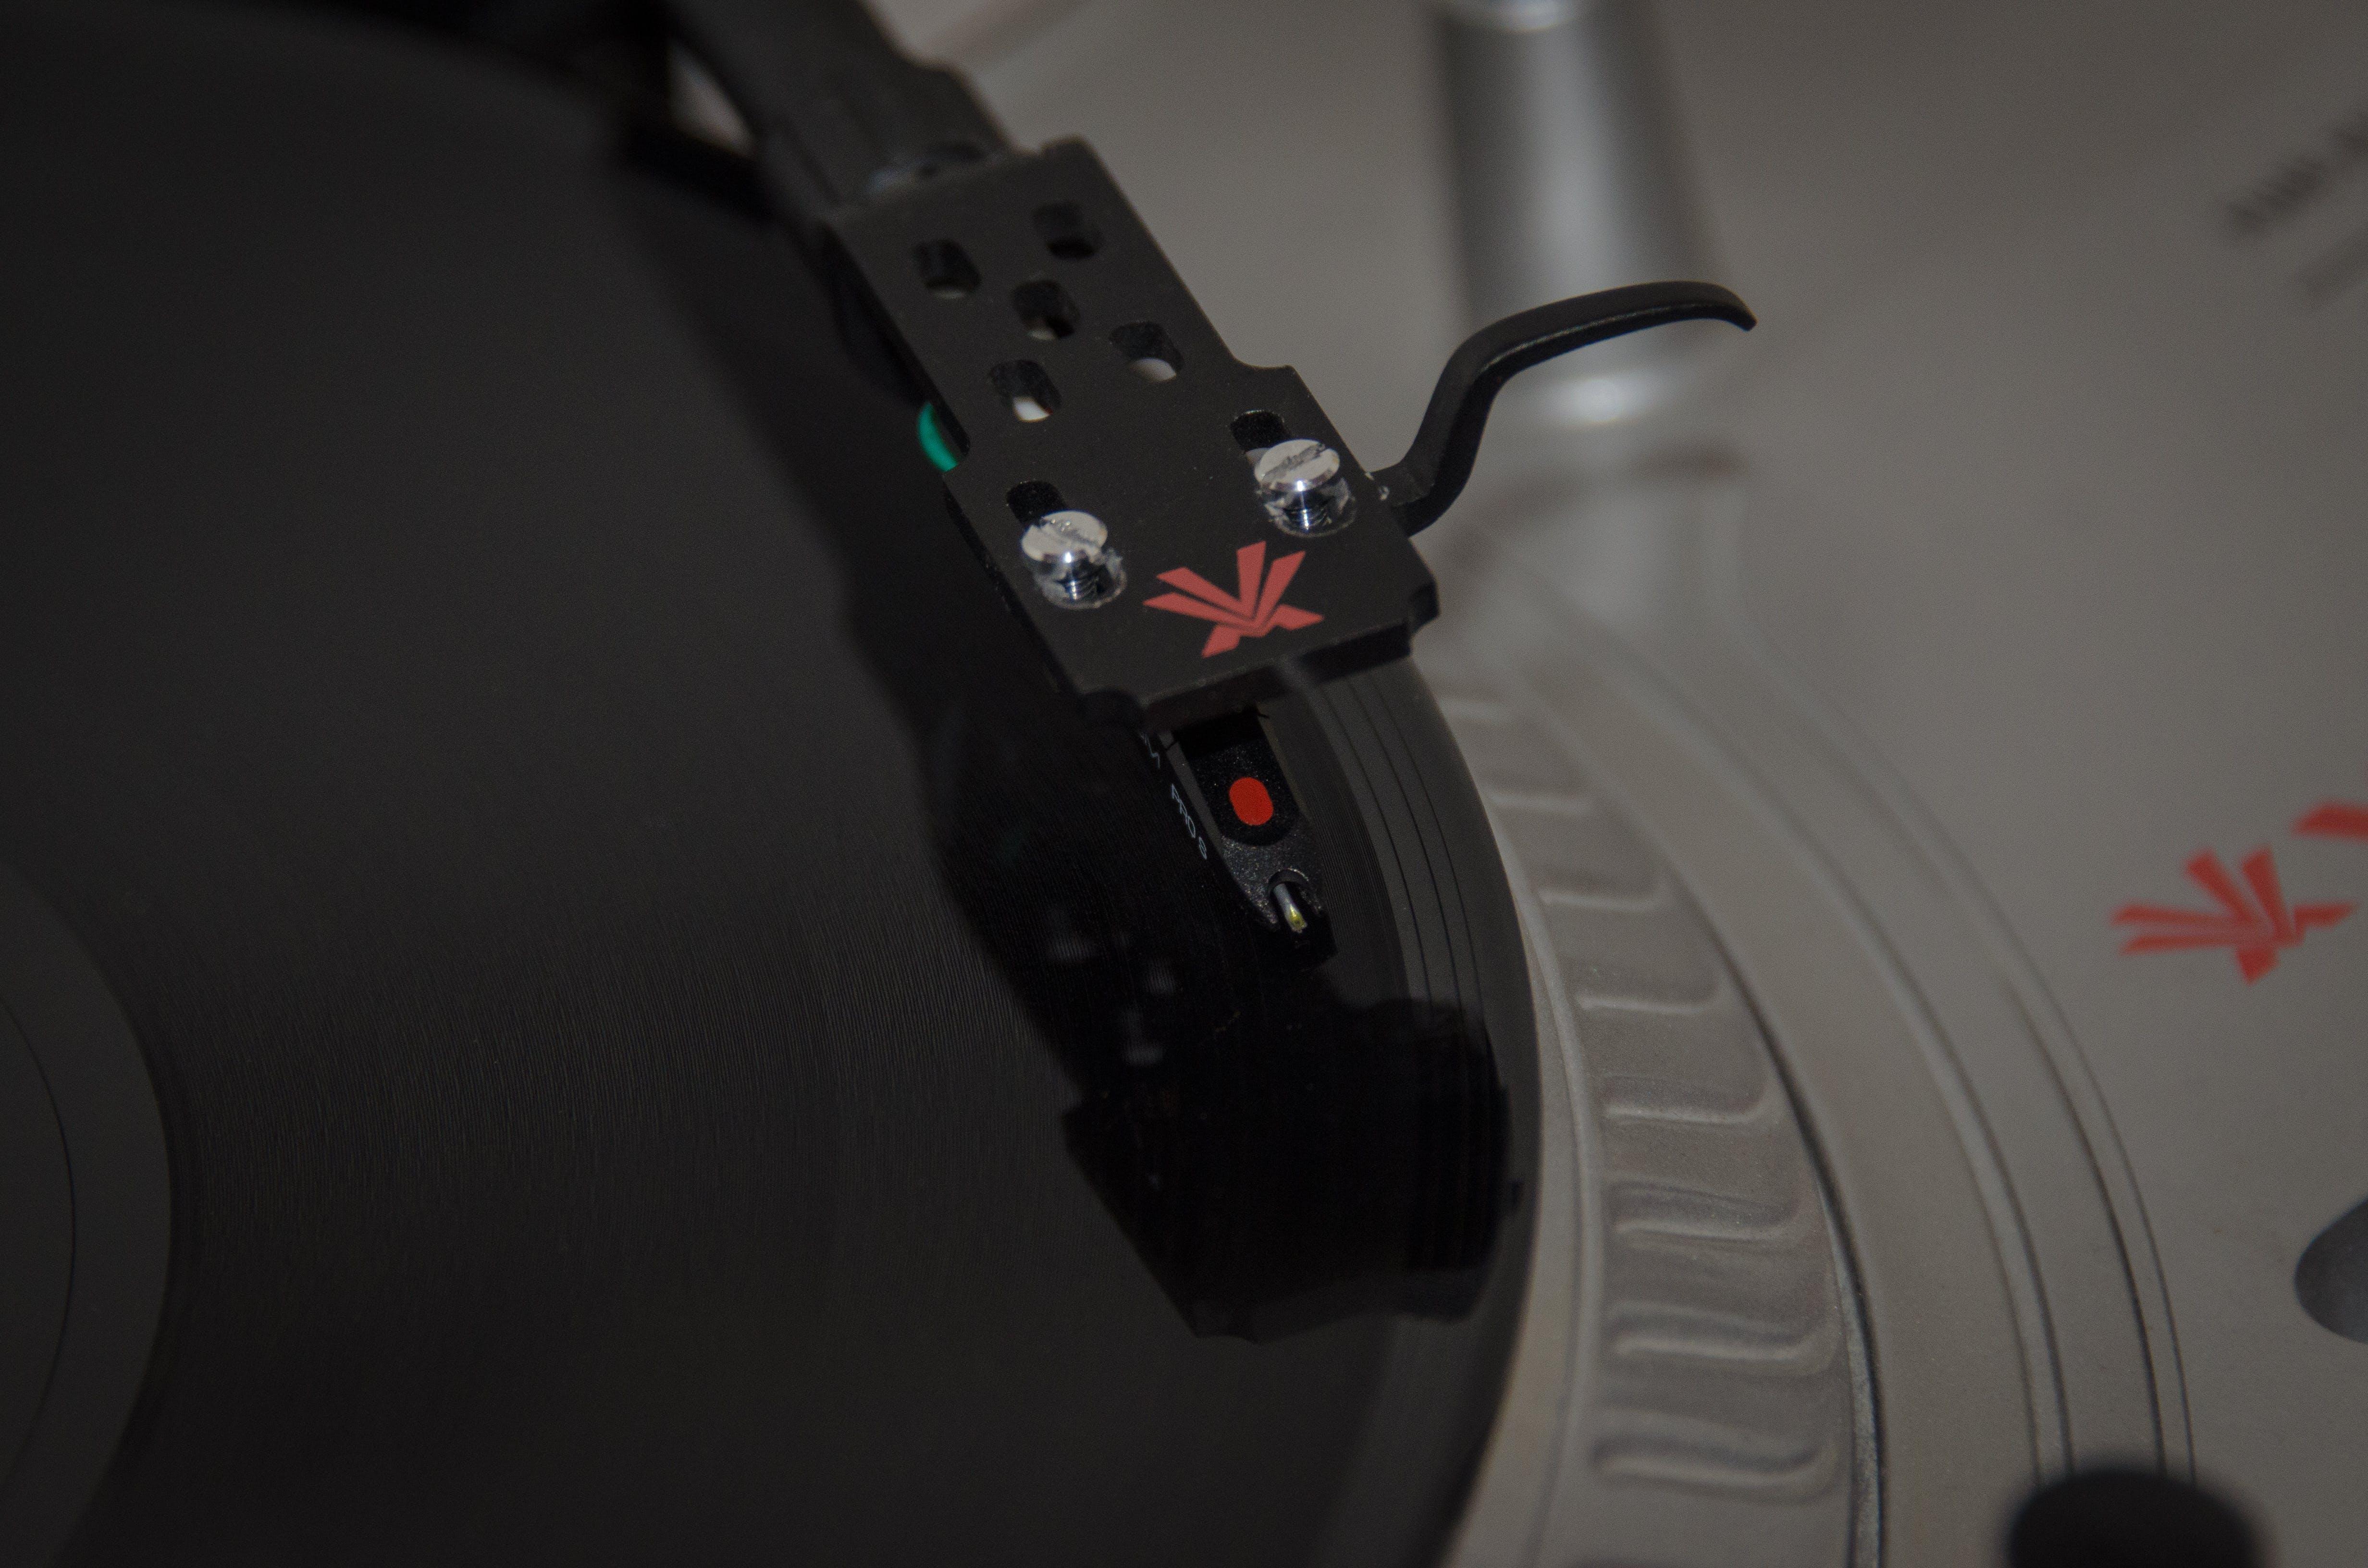 Free stock photo of dj, music, musical equipment, professional